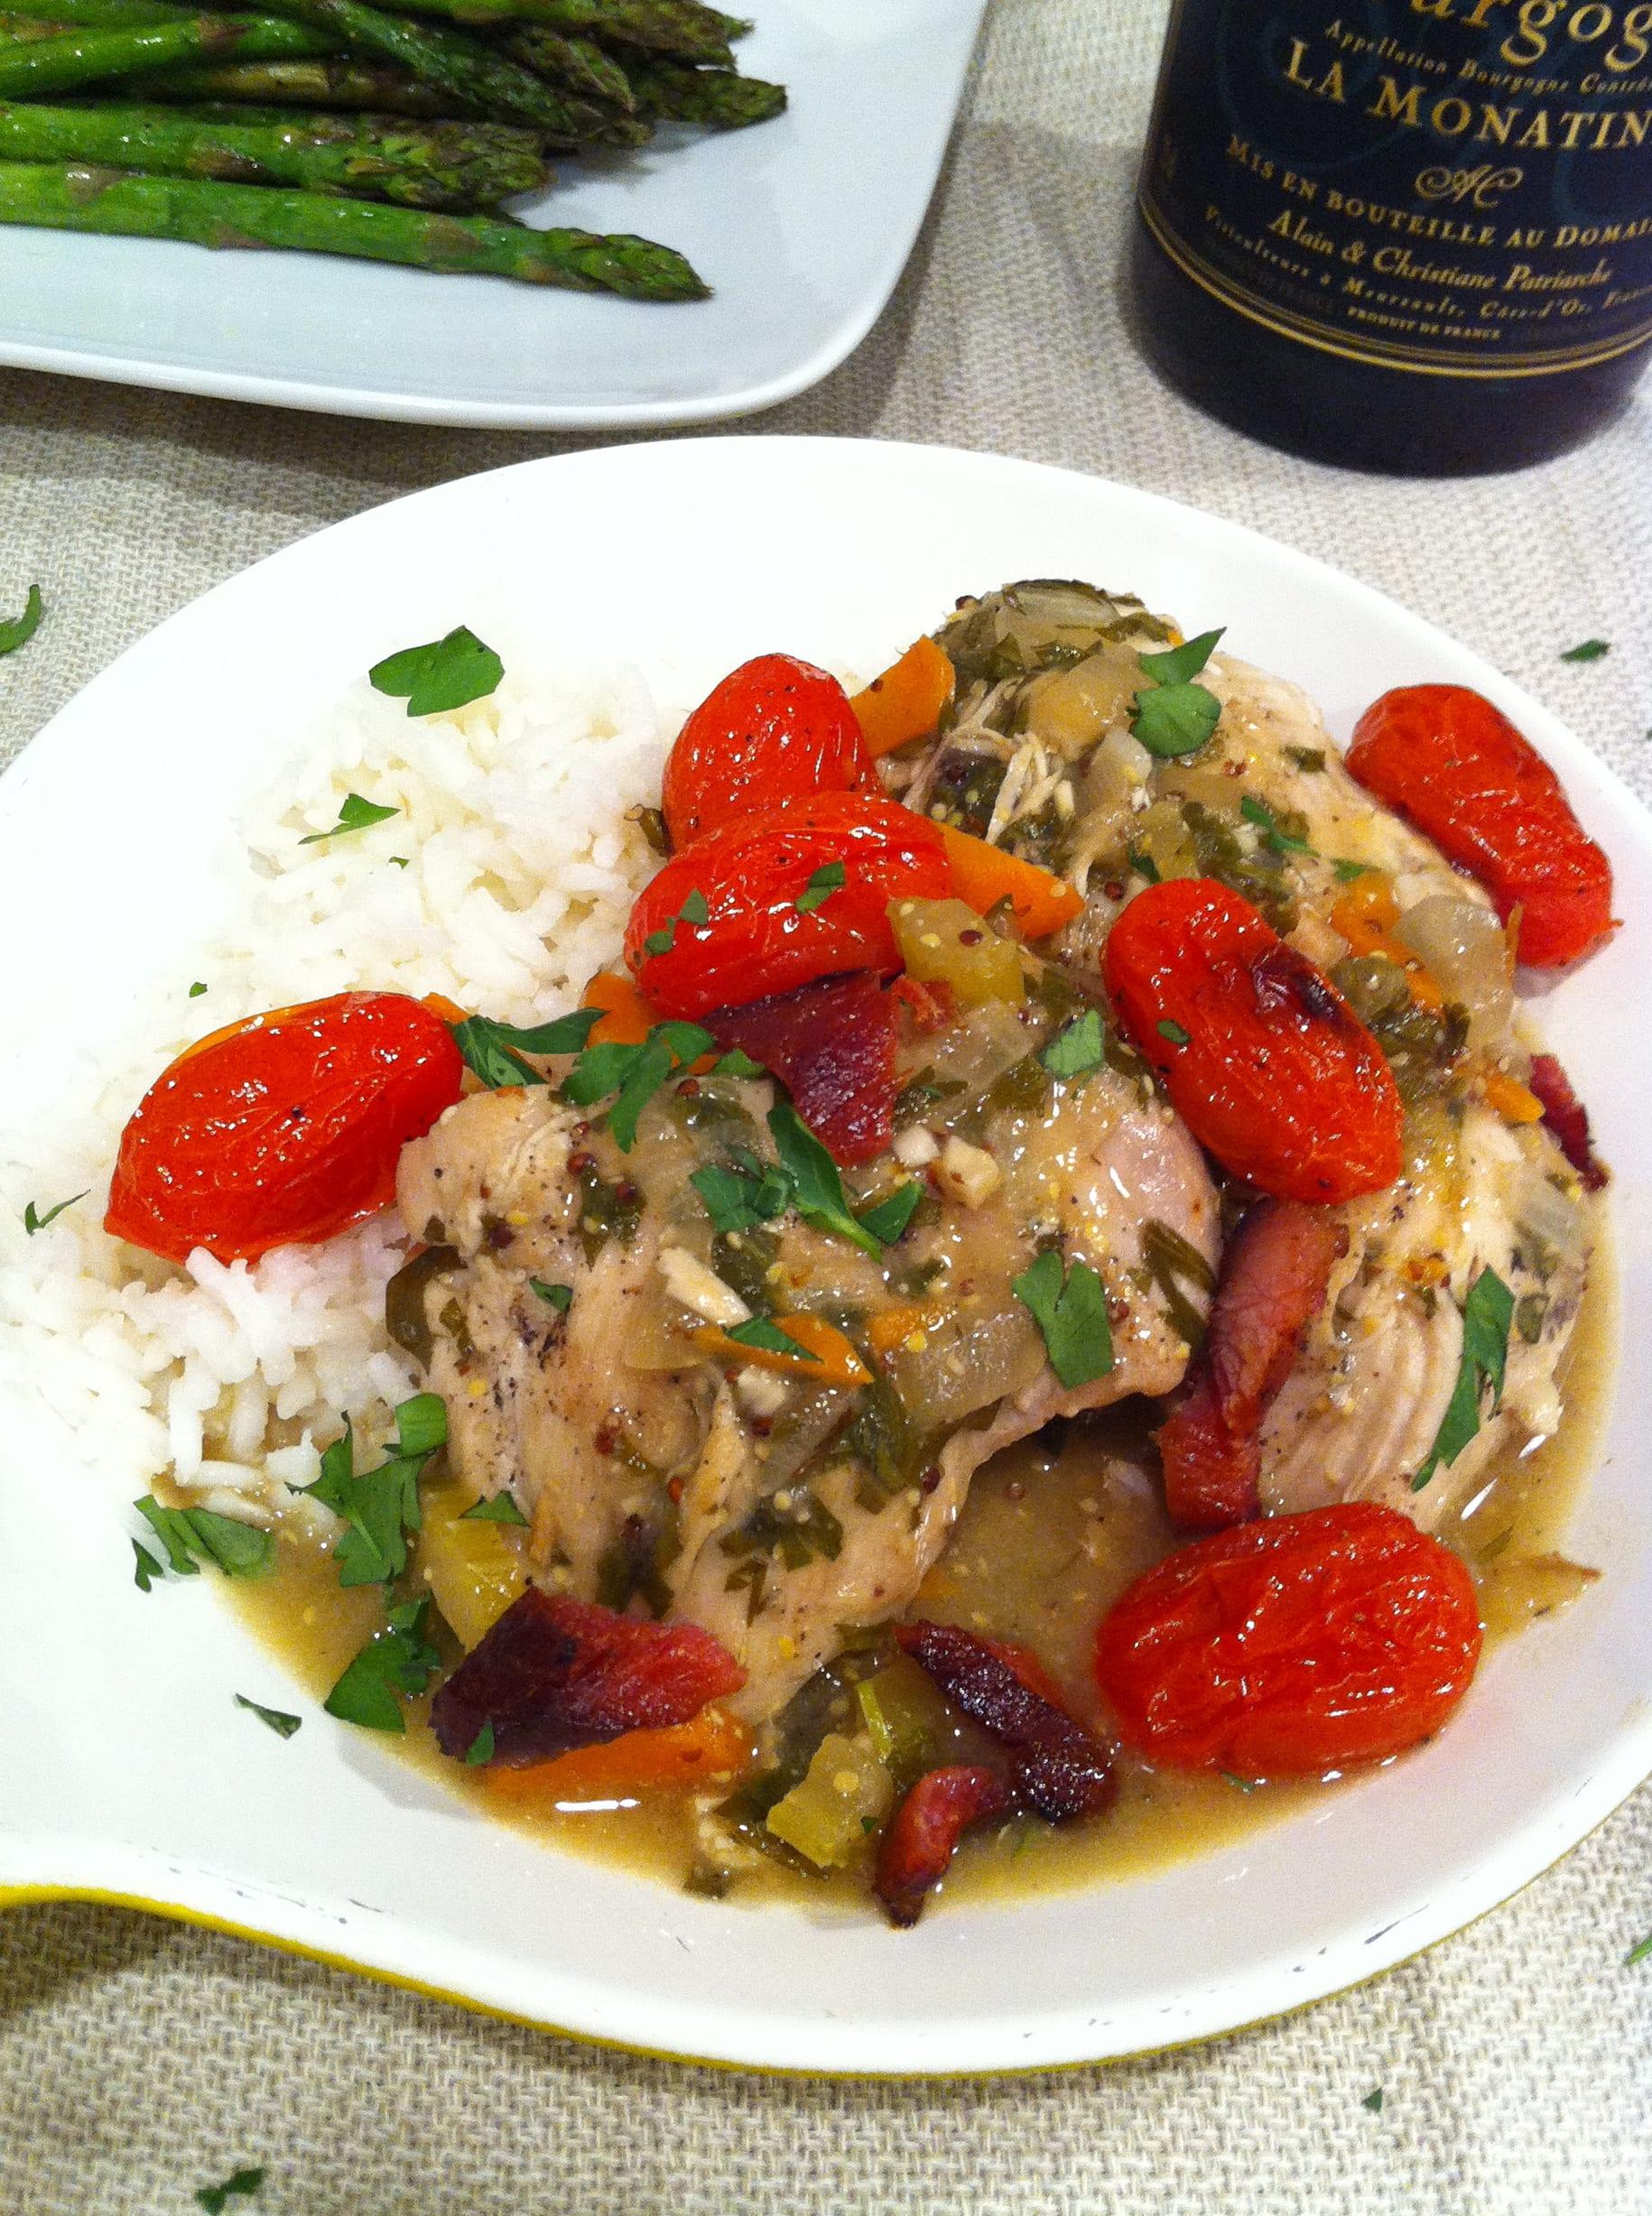 Chicken in Wine Sauce - American Heritage Cooking